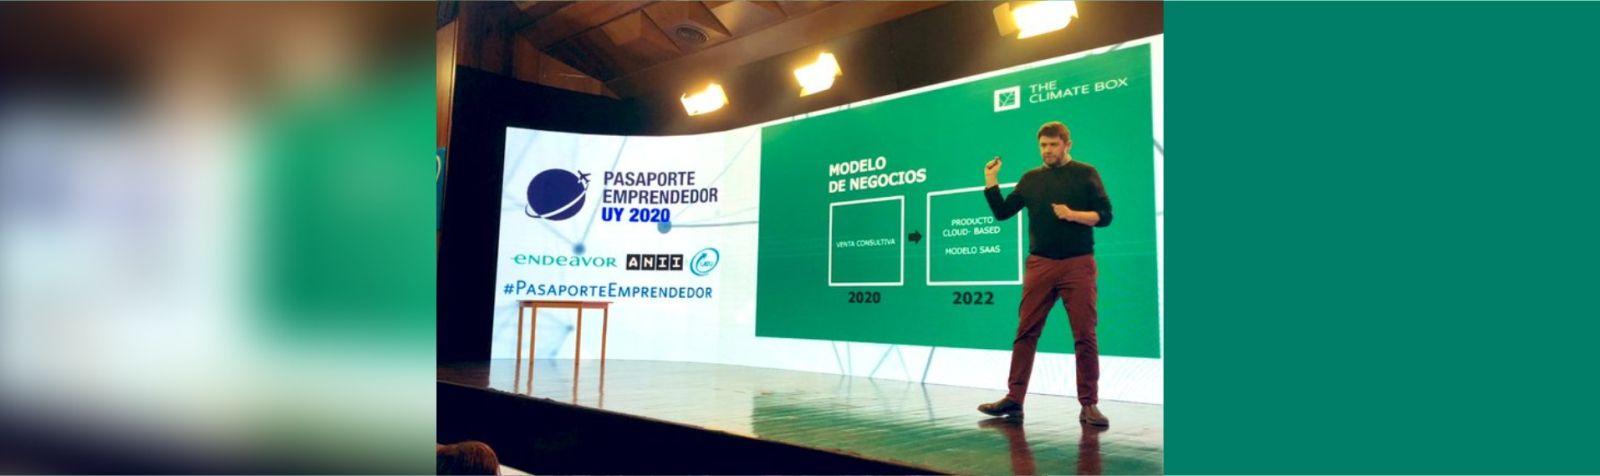 TCB Entrepreneur Passport 2020 finalist